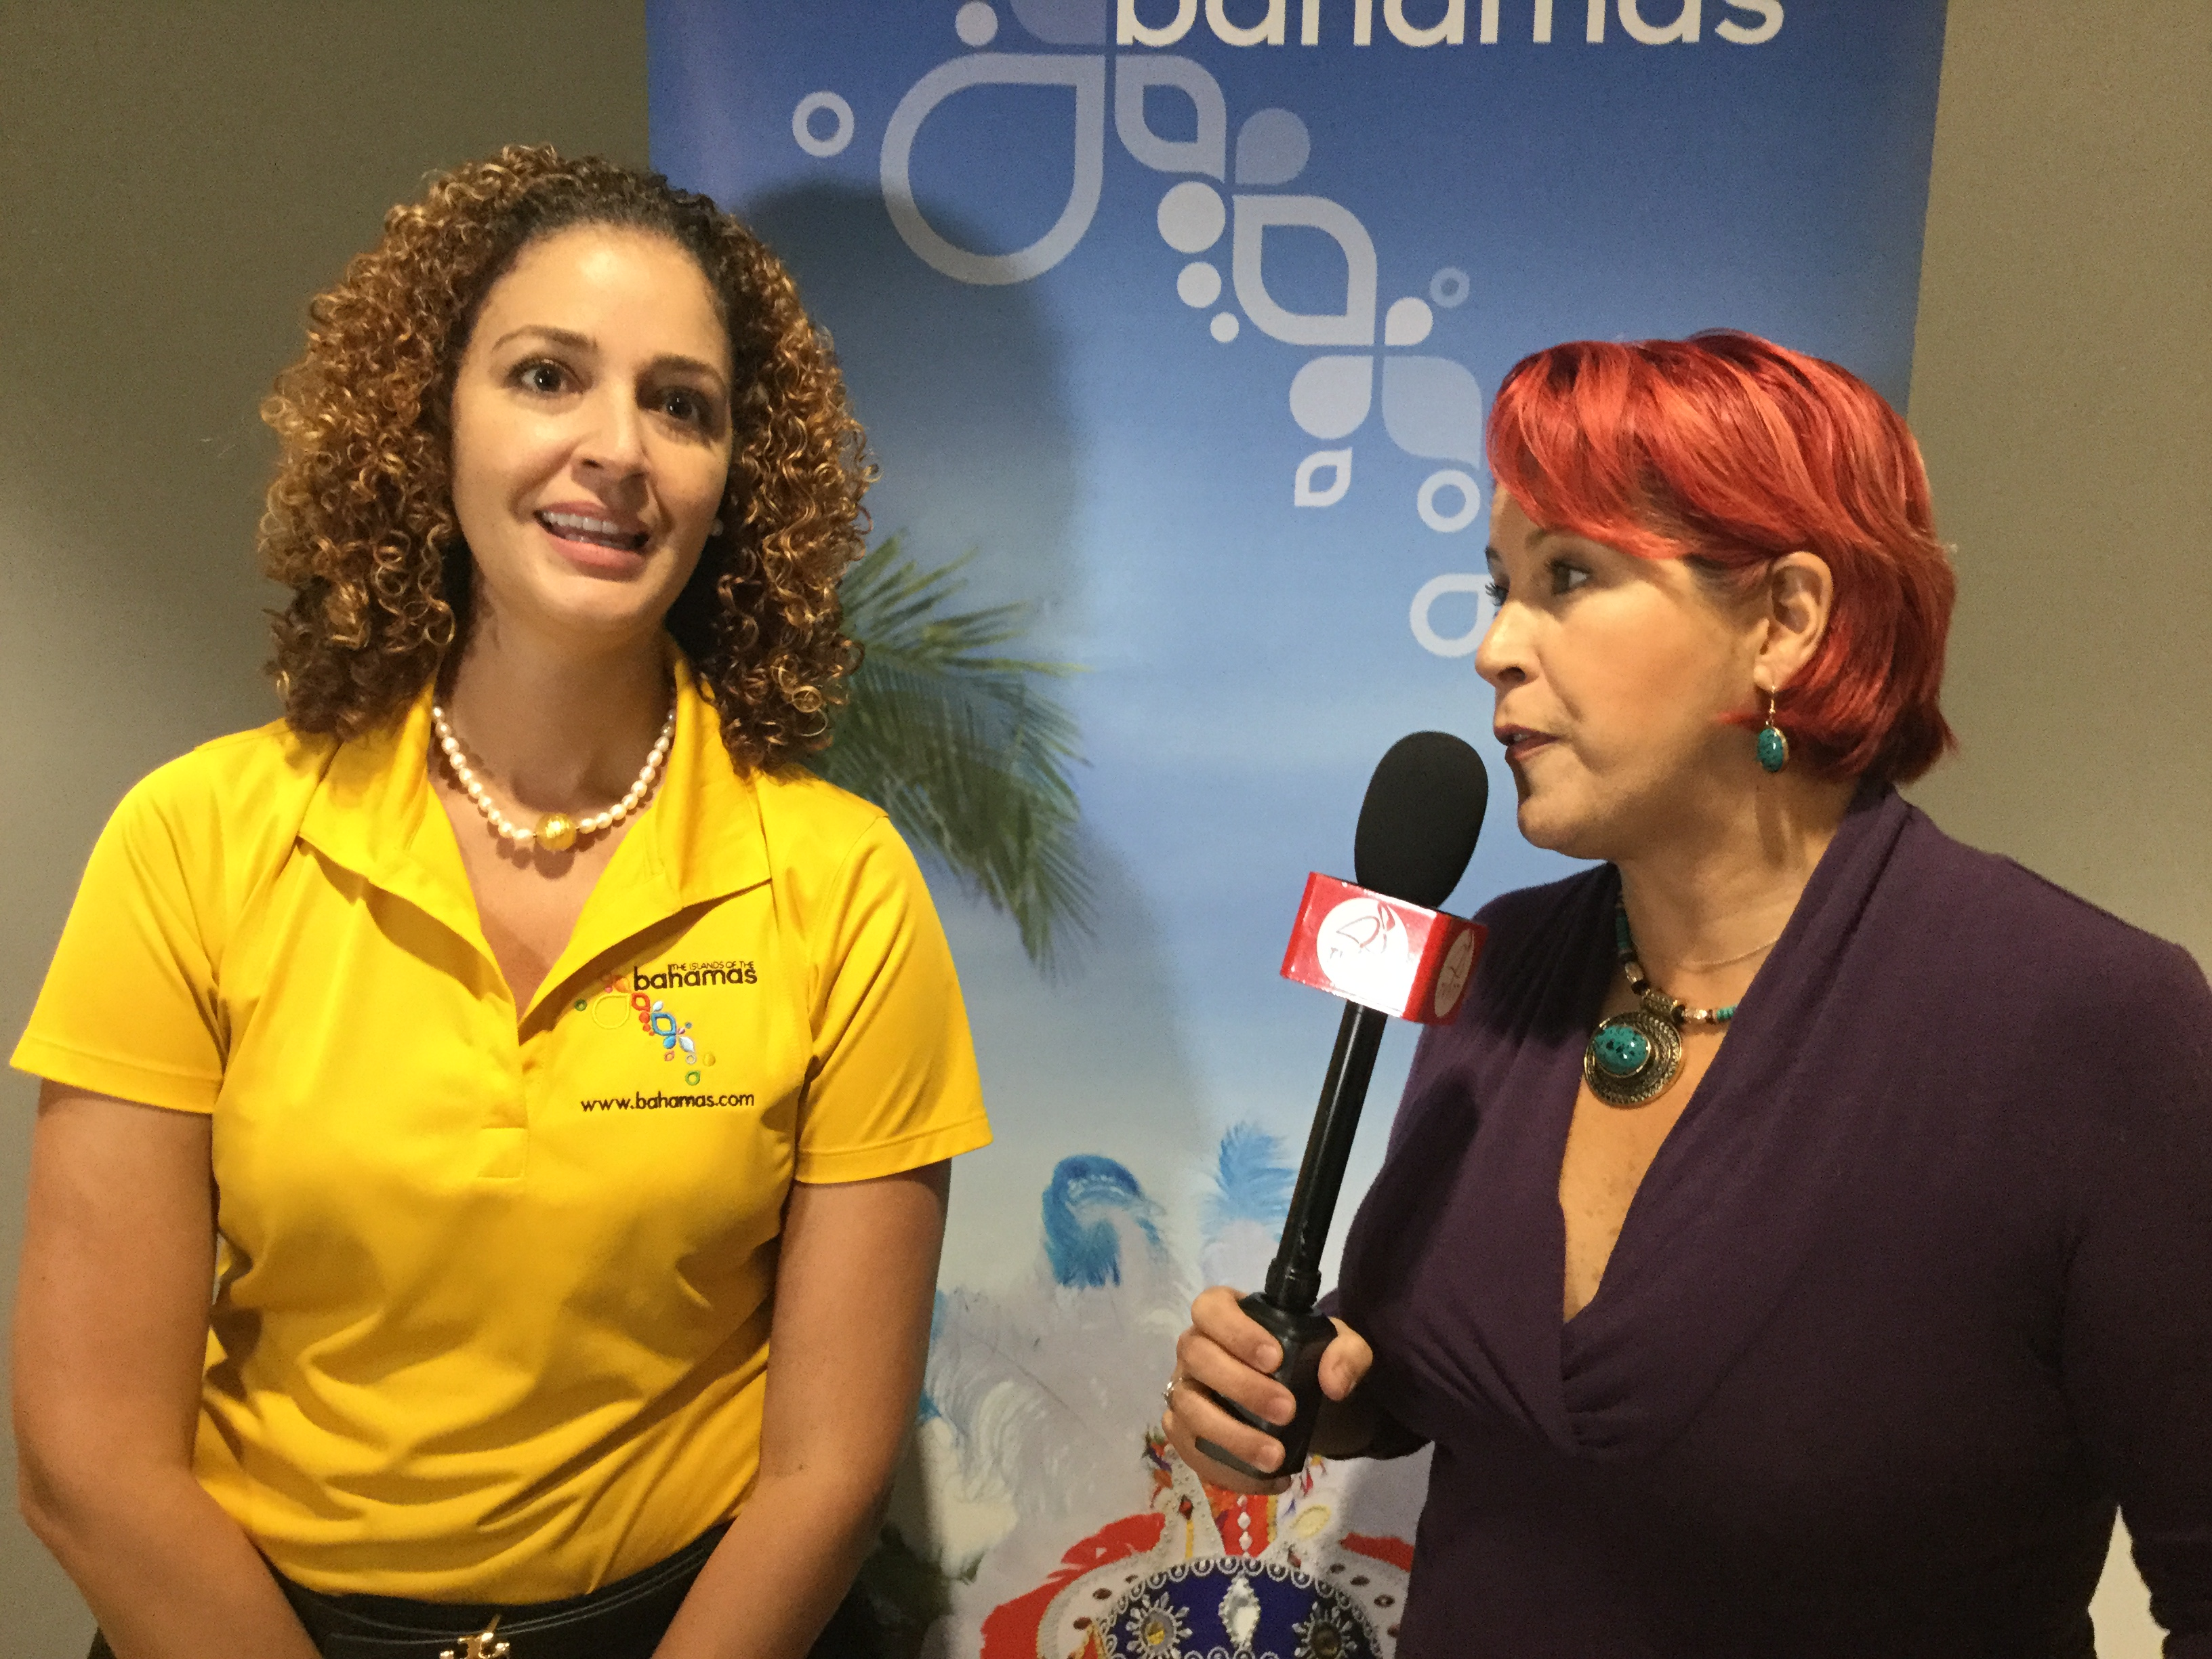 Bahamas brand exposed to South Florida's Hispanic community